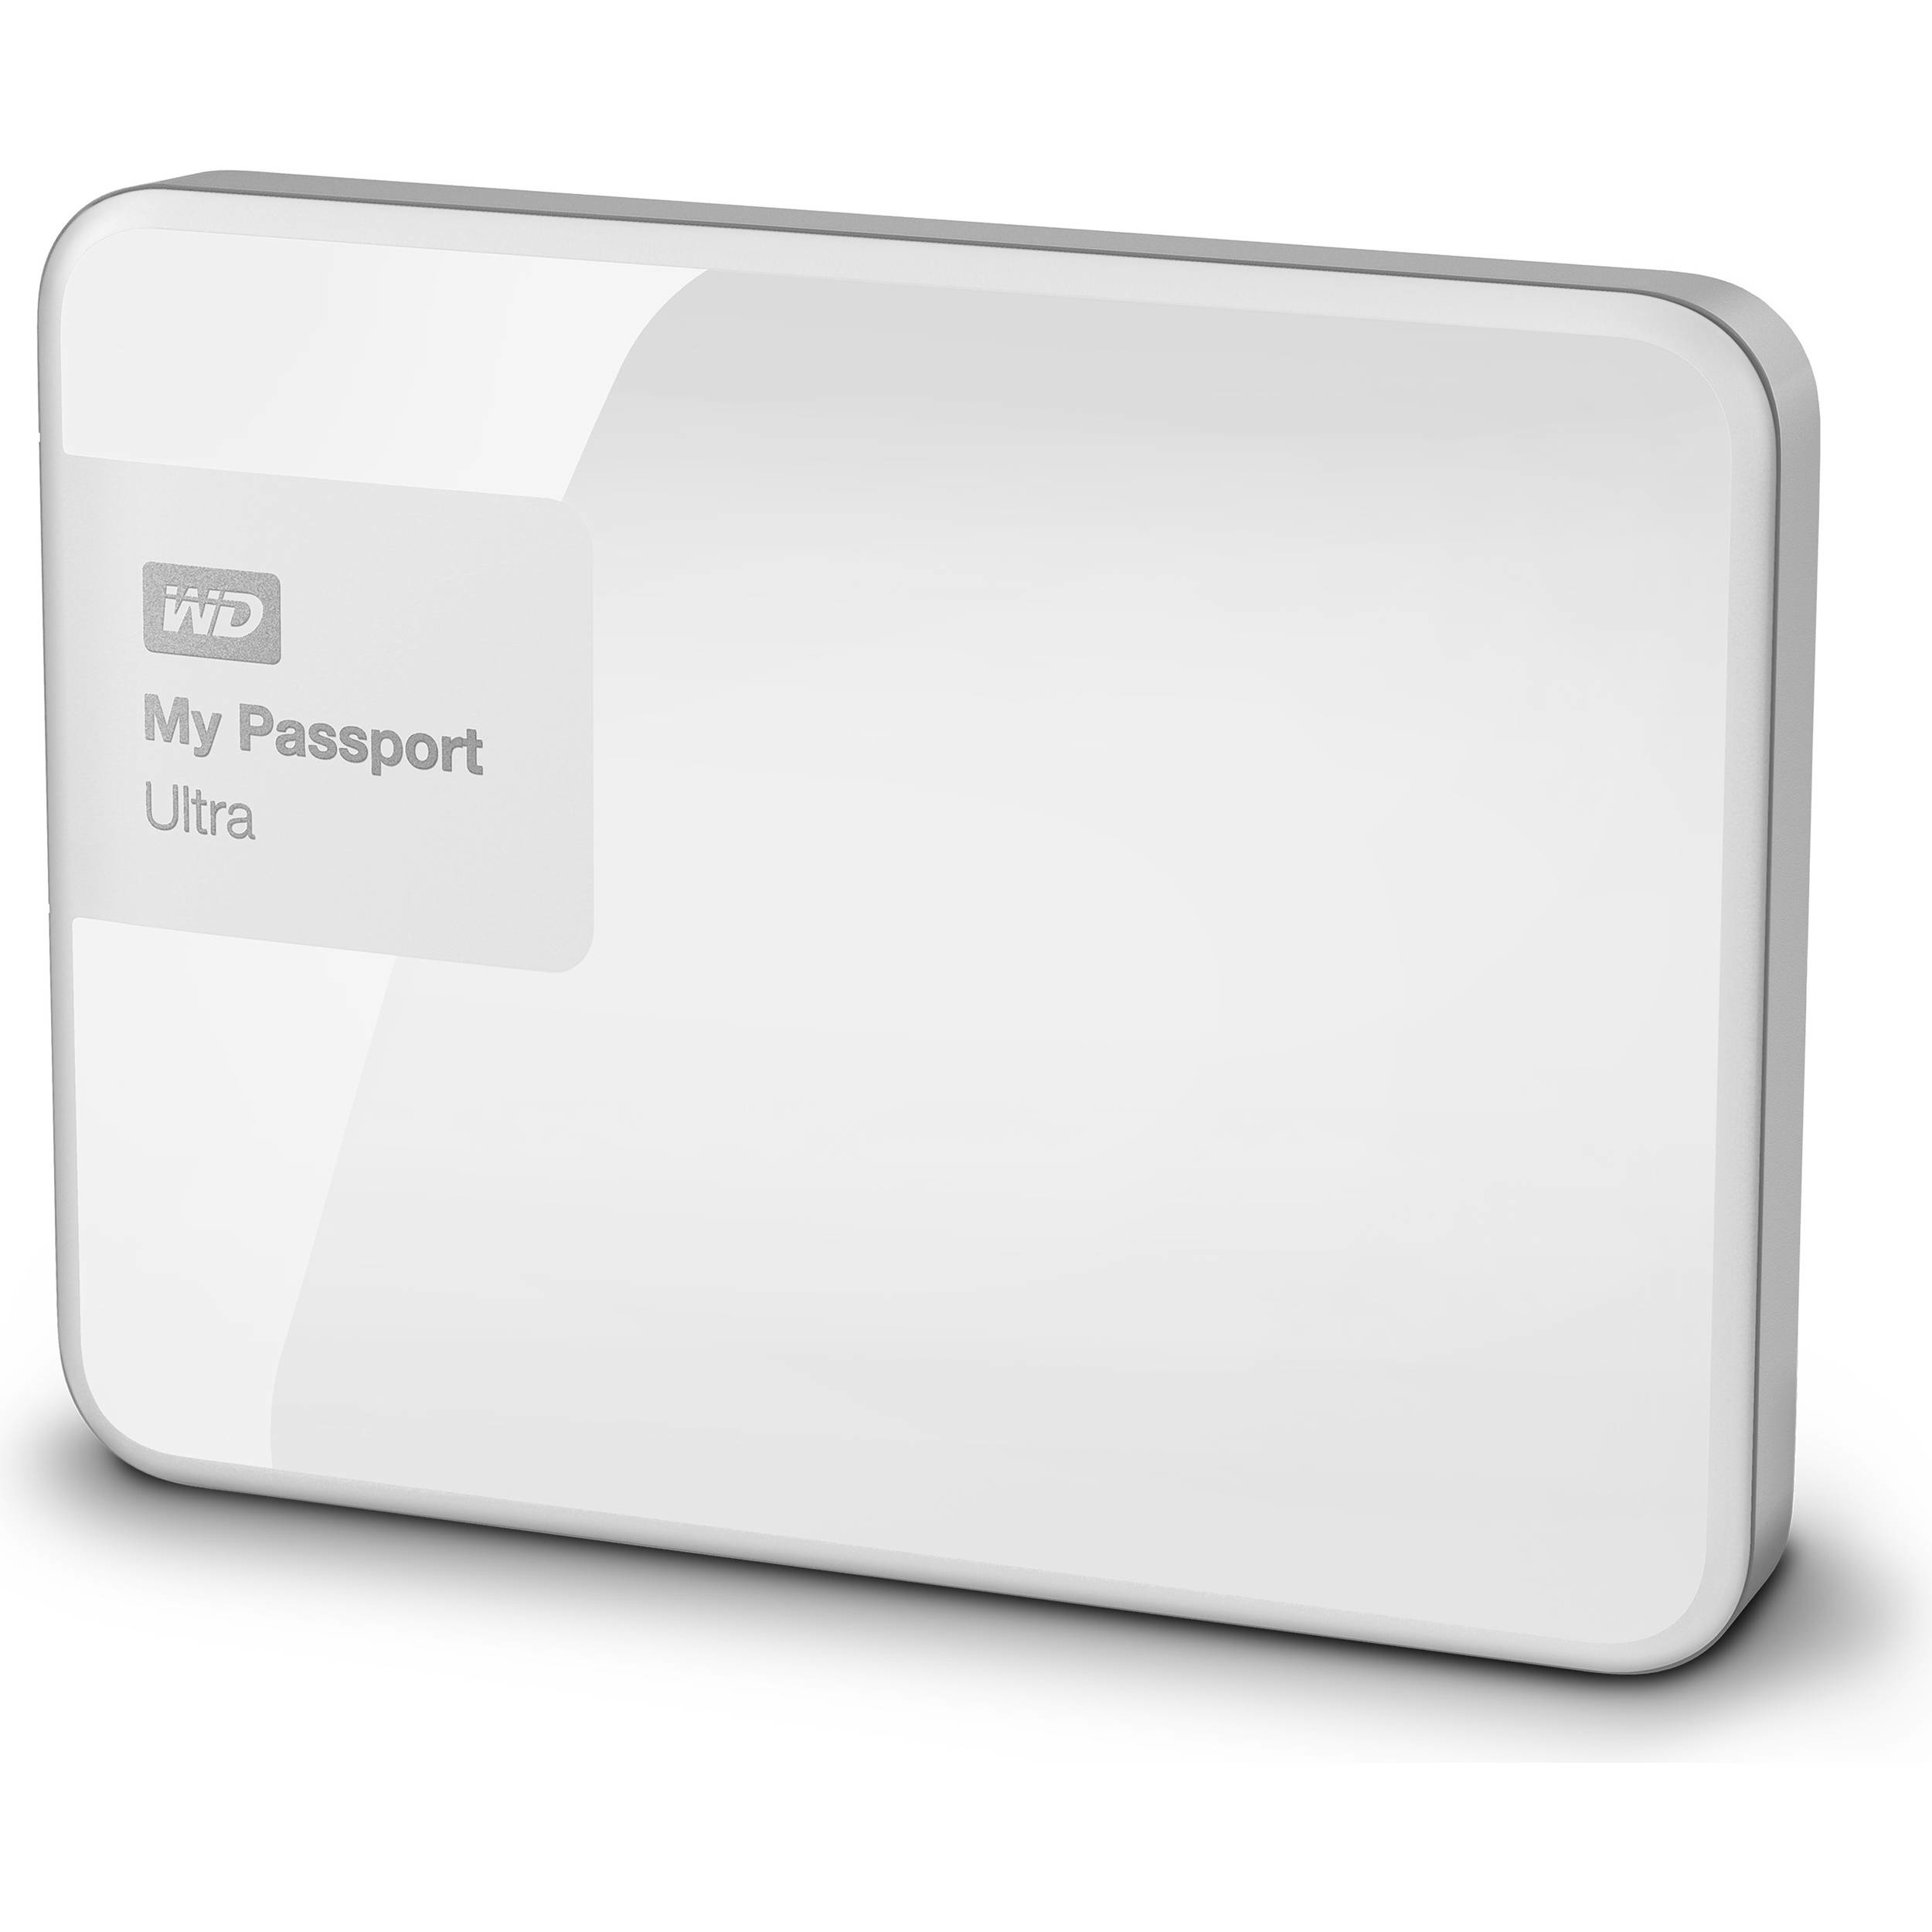 Western Digital WDBWWM5000AWT-EESN external hard drive